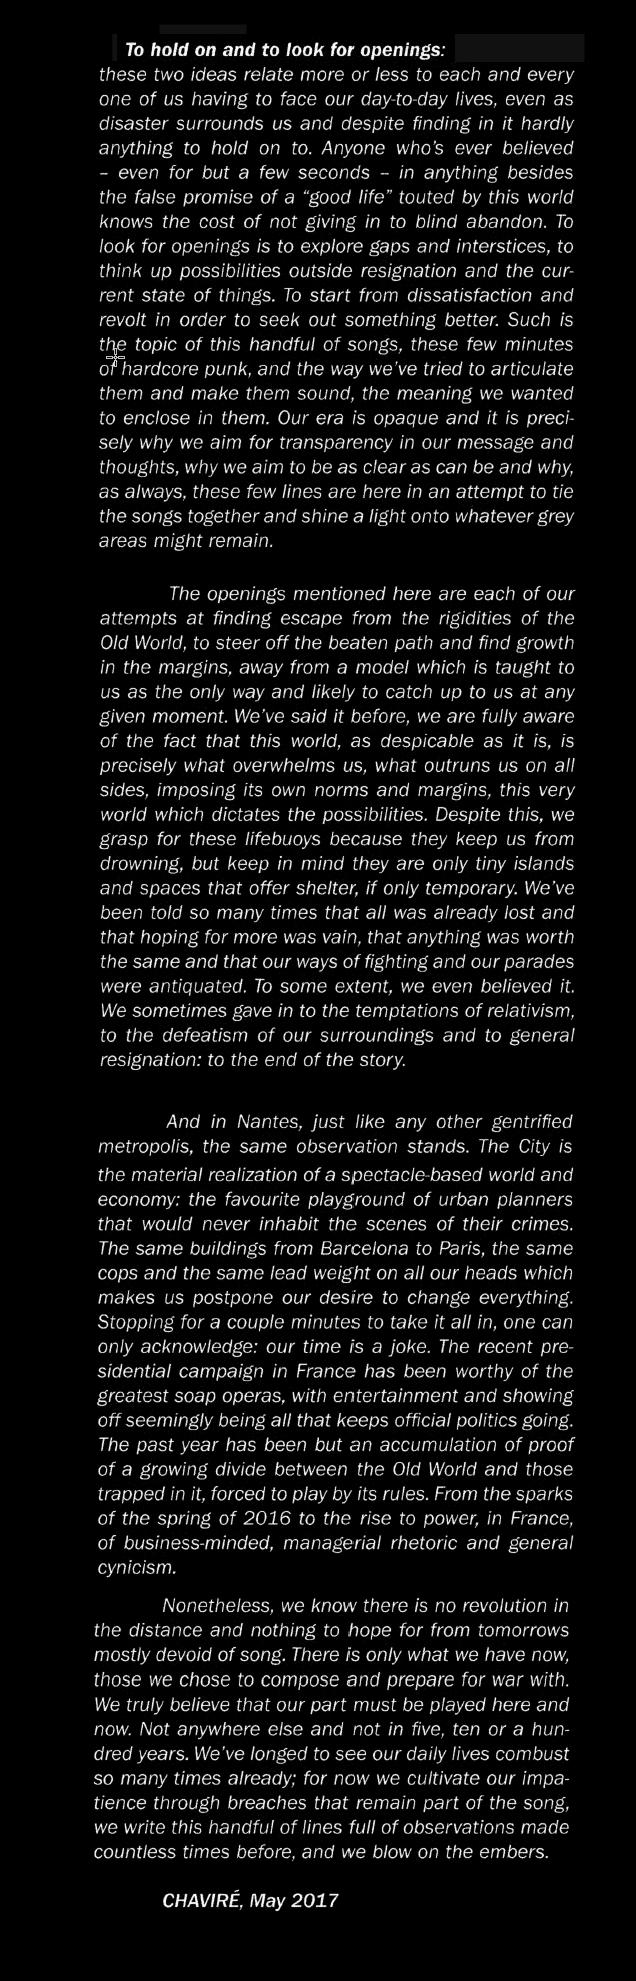 CHAVIRE statement